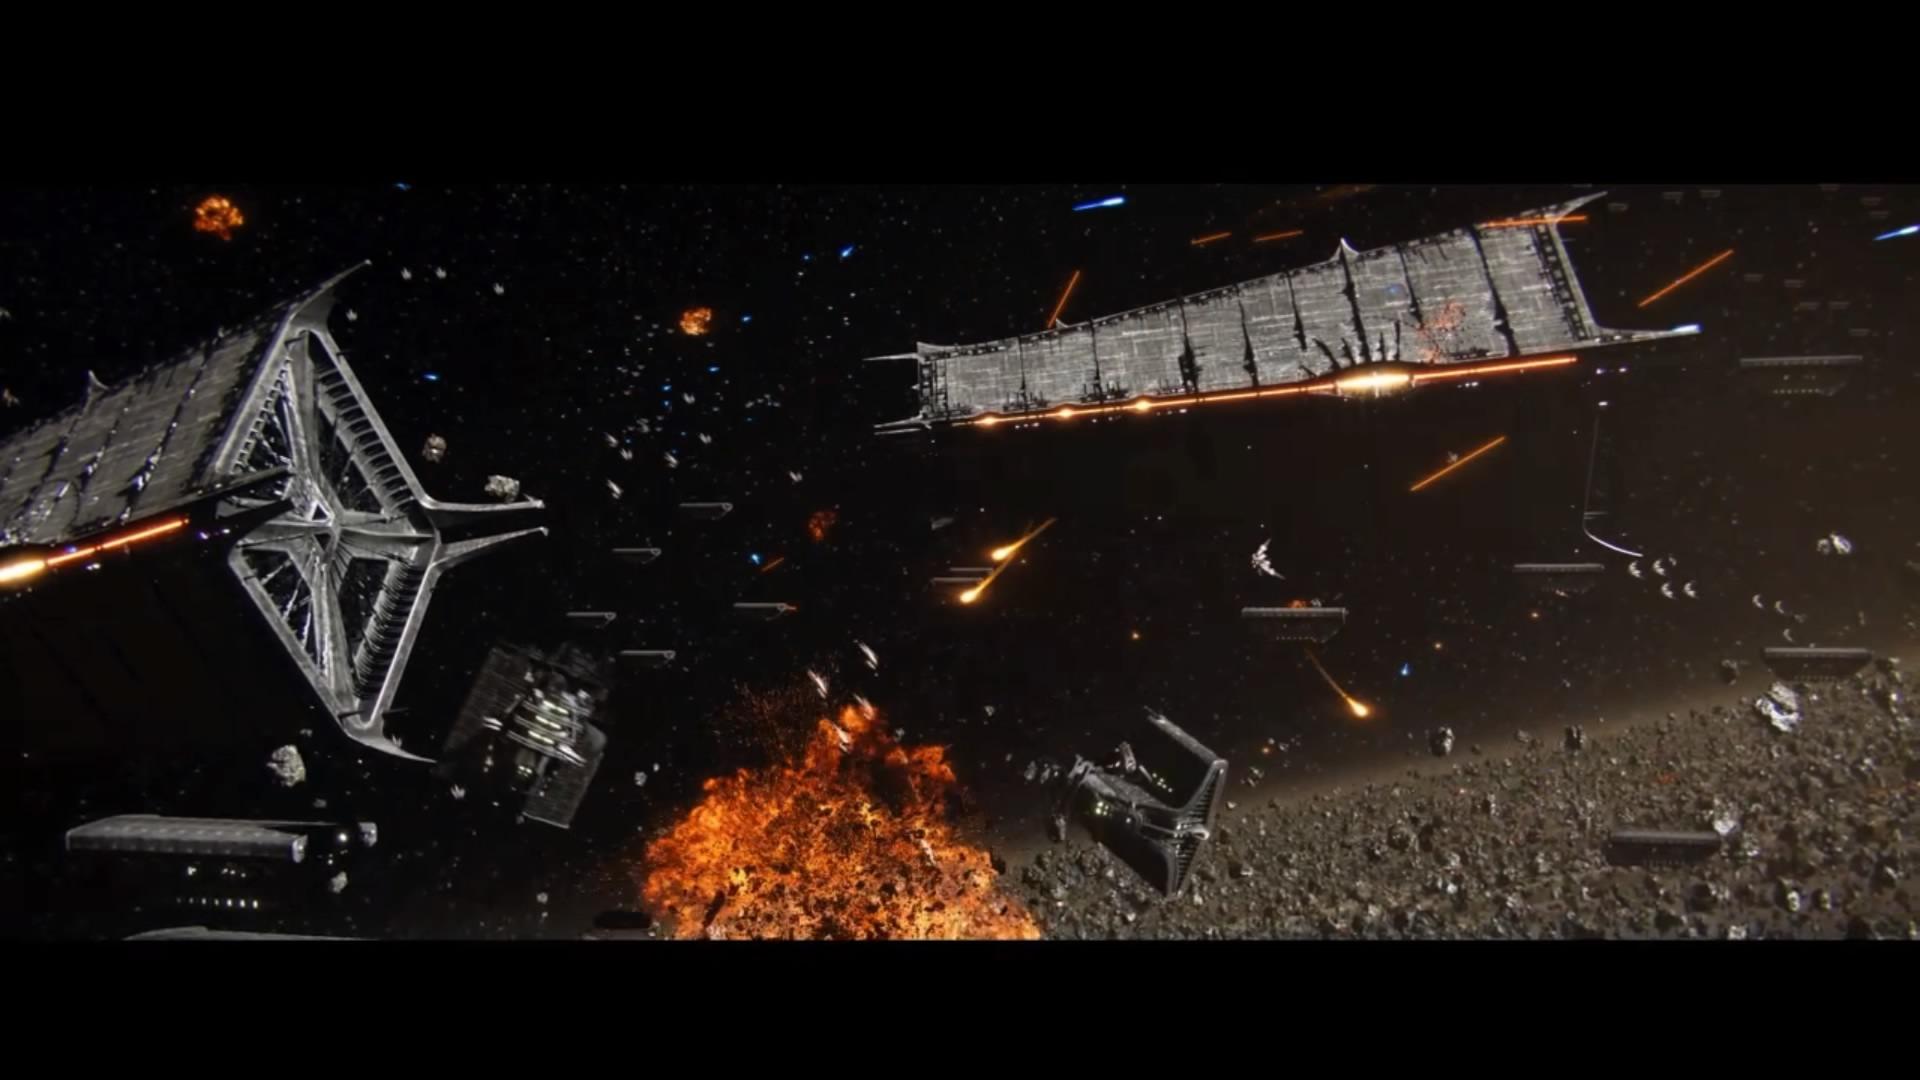 Destiny: The Taken King intro cutscene